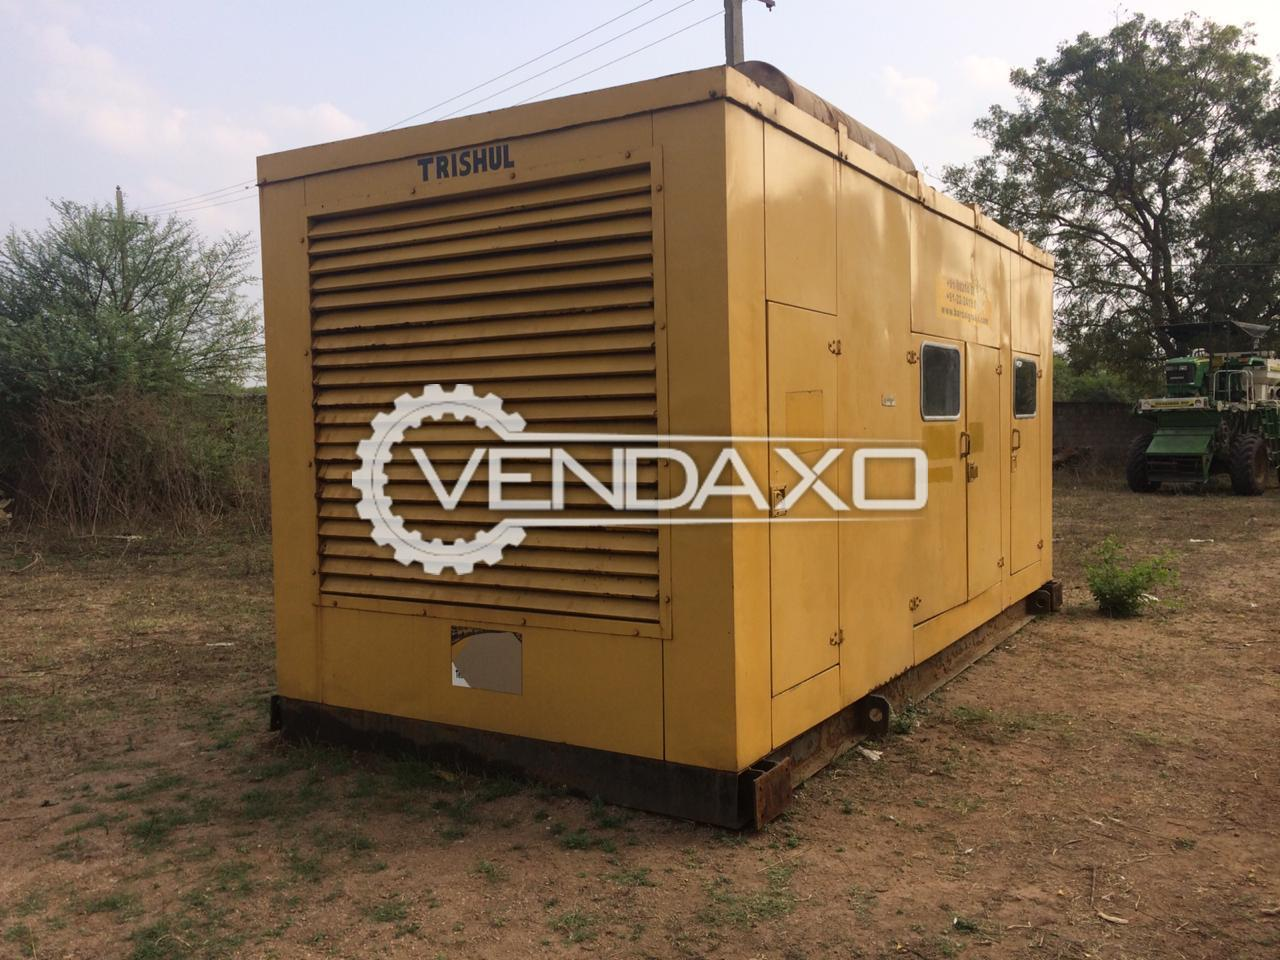 Caterpillar Diesel Generator - 750 kVA, 2007 Model